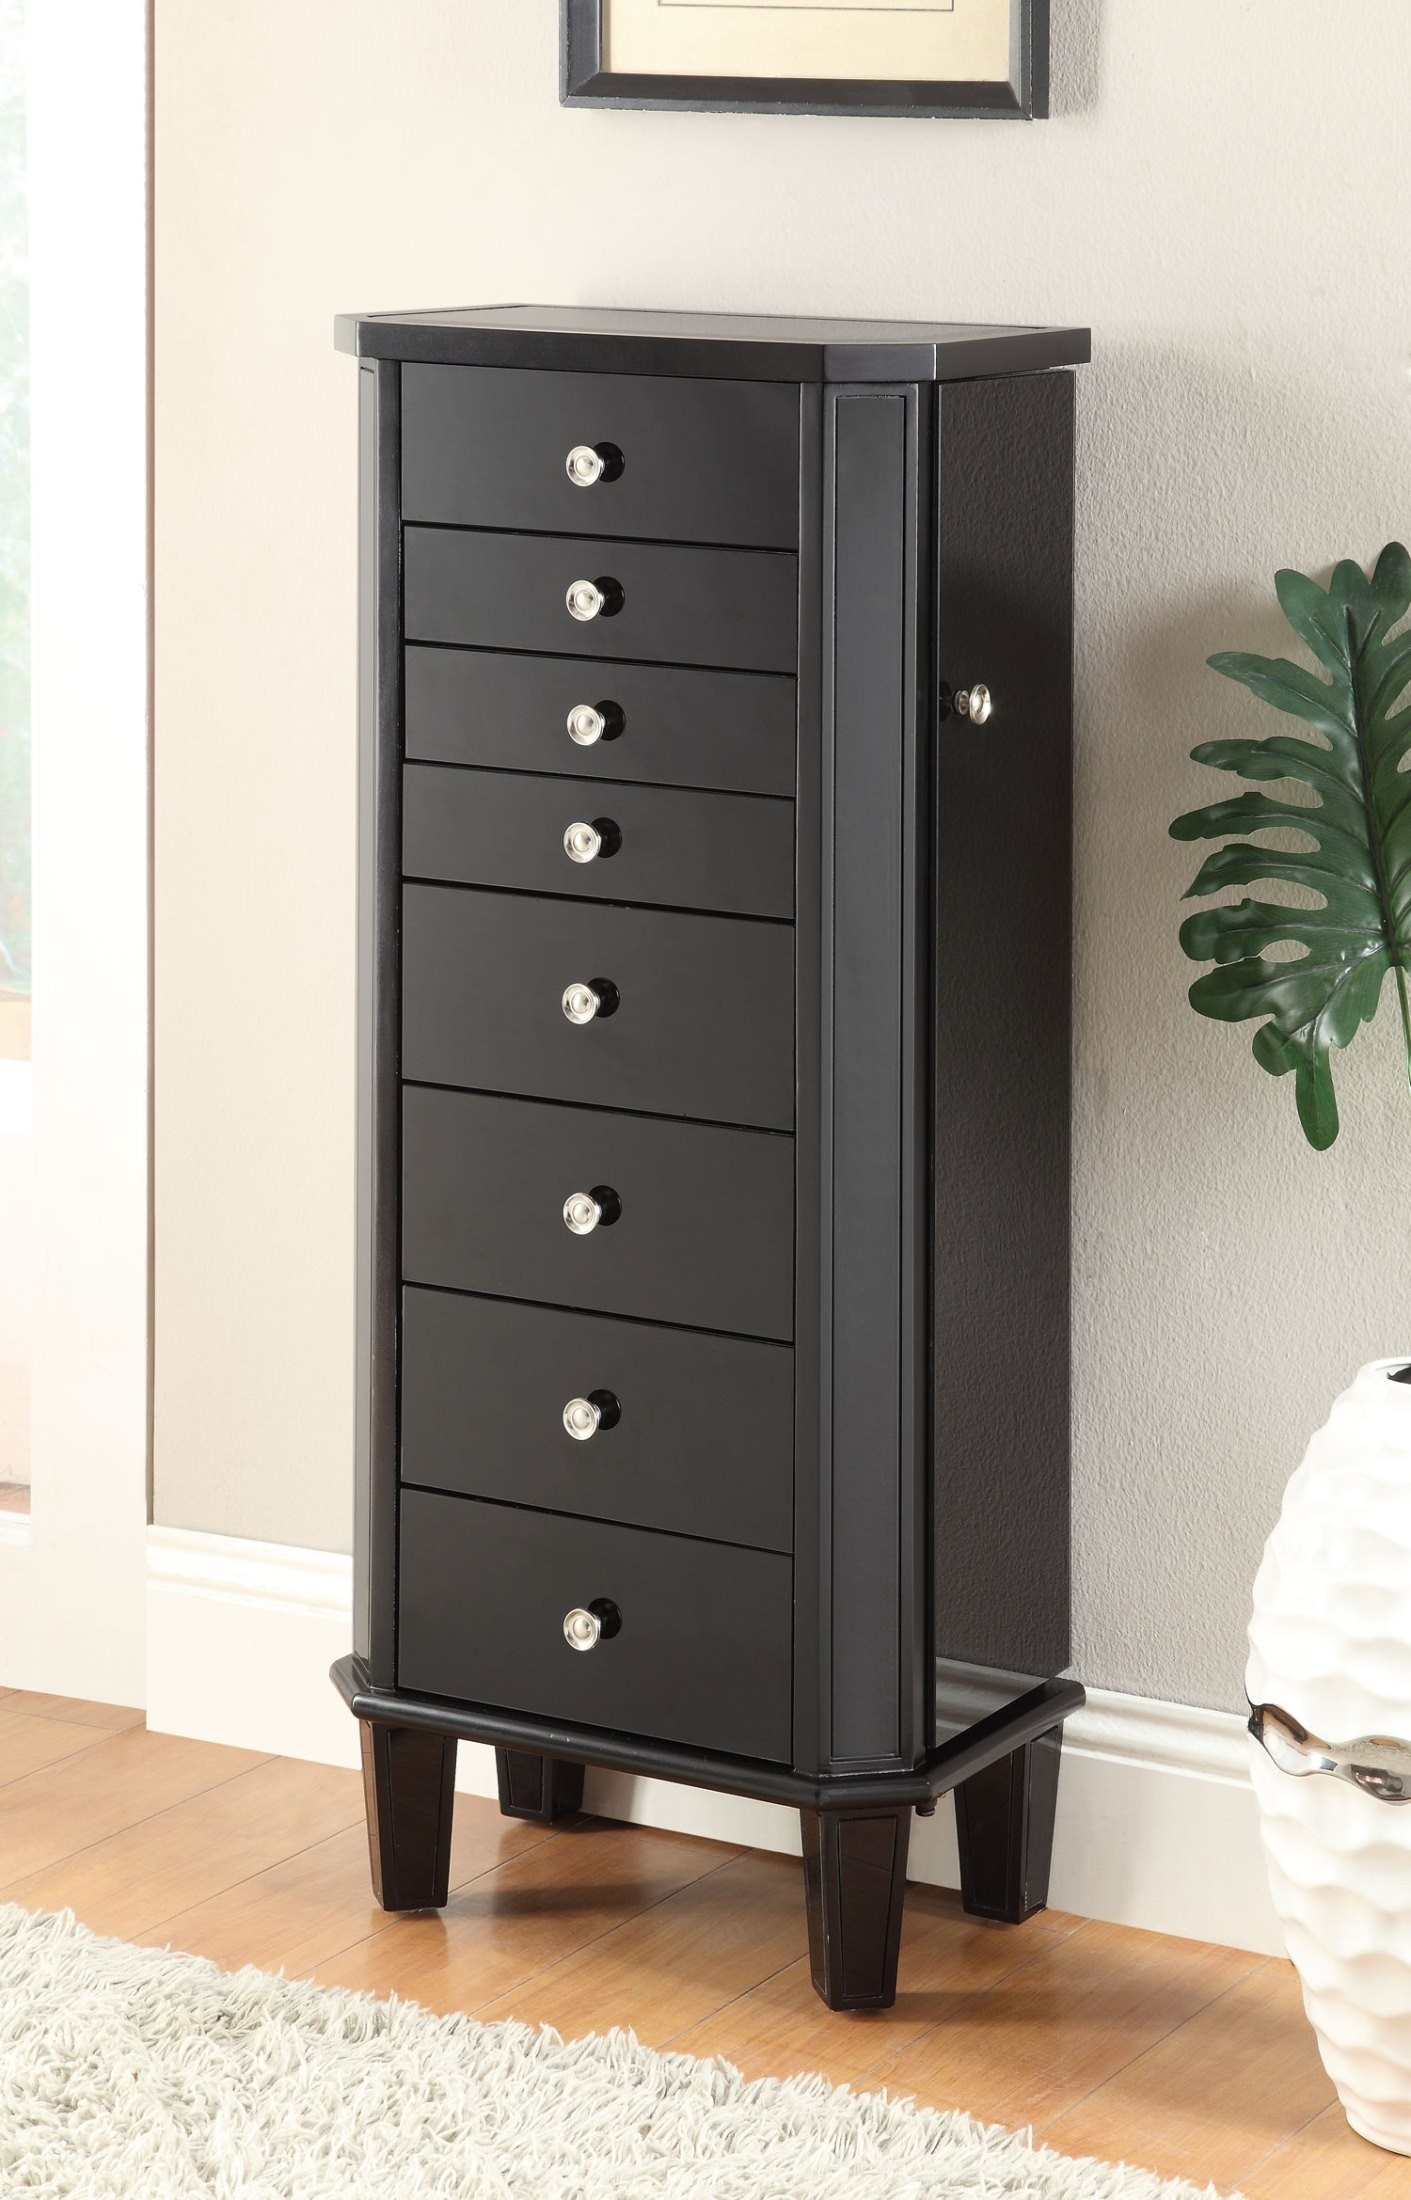 Black Jewelry Armoire, 903809, Coaster Furniture